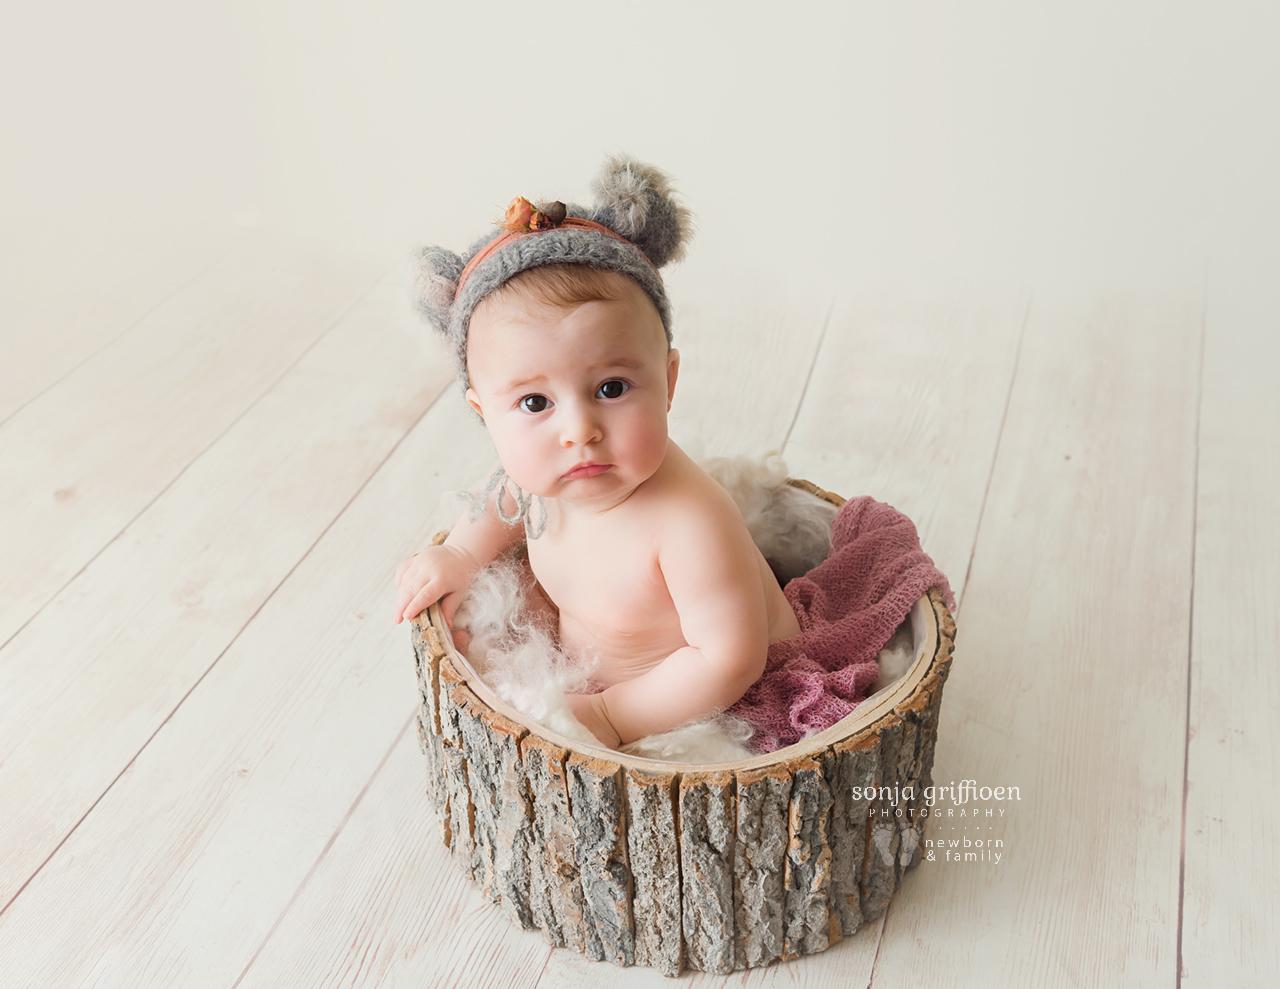 Everlyn-Milestone-Brisbane-Baby-Photography-Sonja-Griffioen-02b.jpg